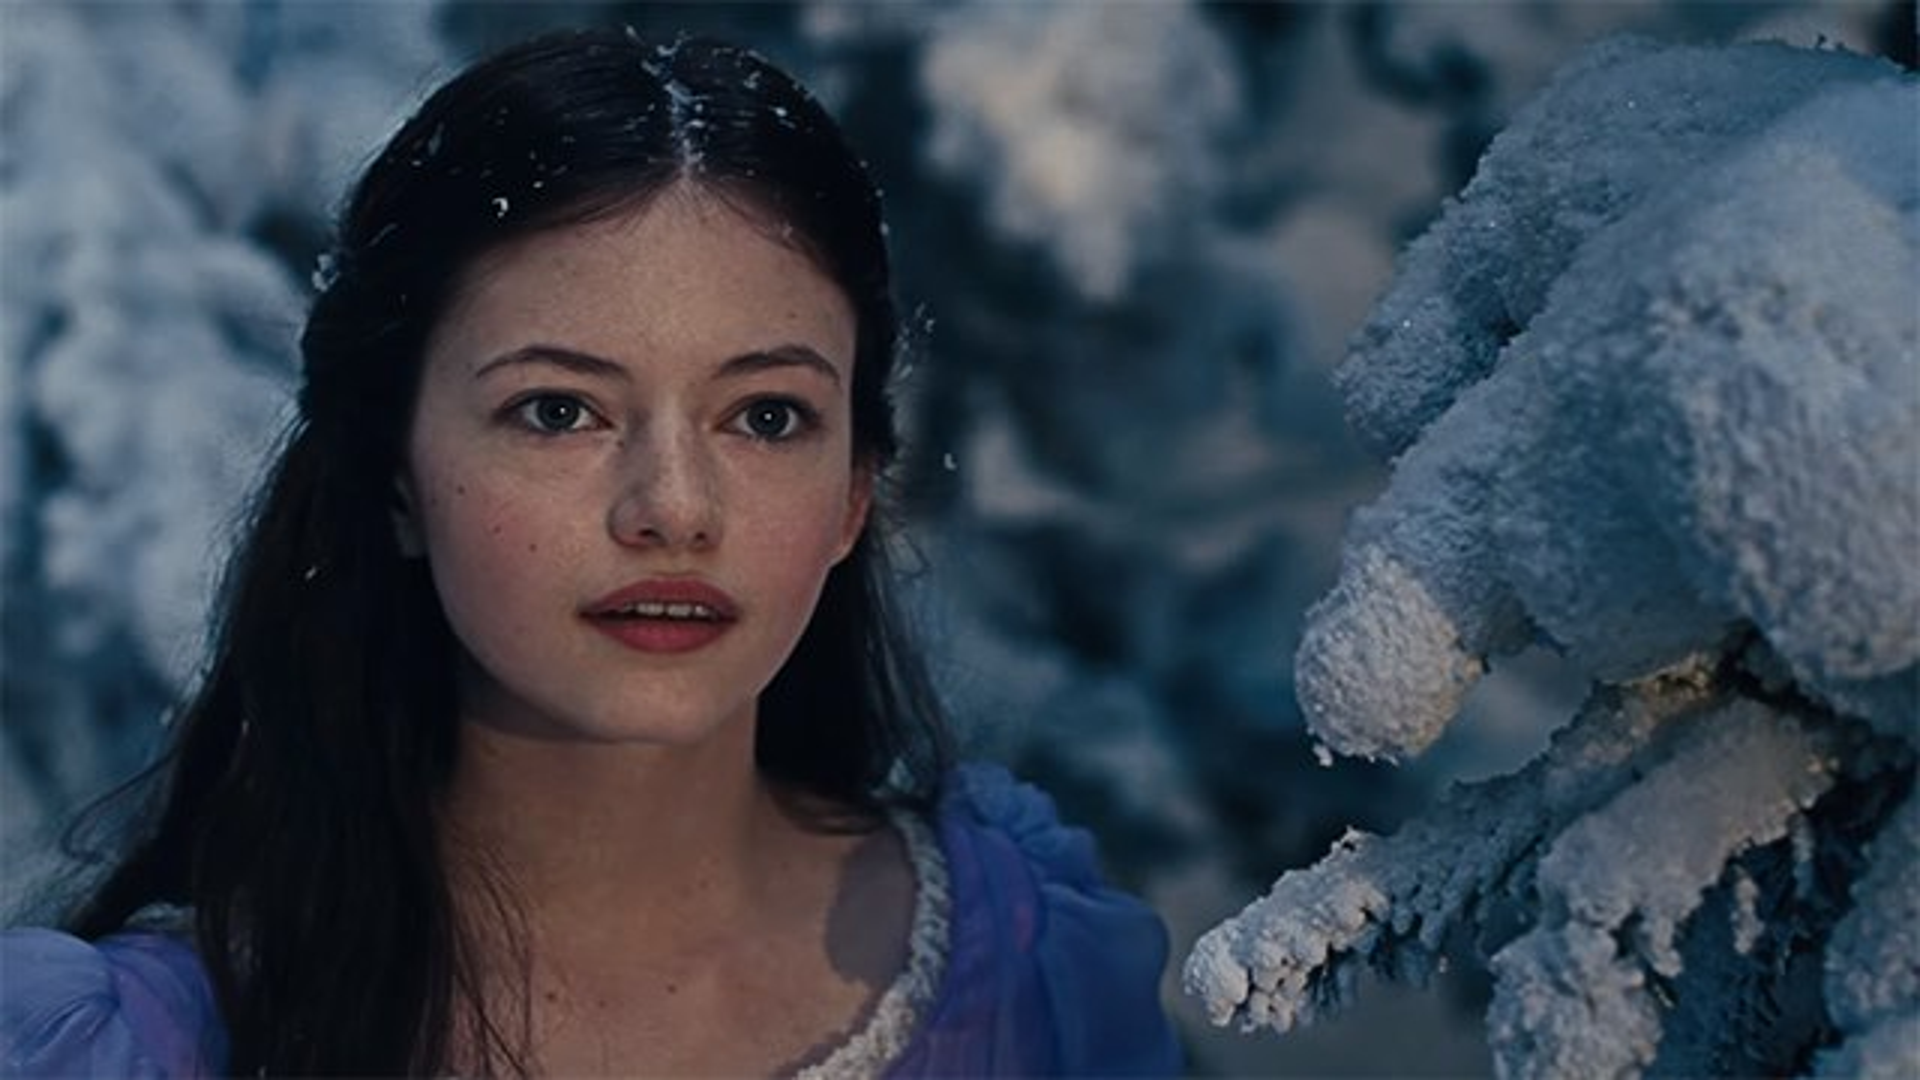 Mackenzie-Foy-The-Nutcracker-and-the-Four-Realms-Teaser-Trailer